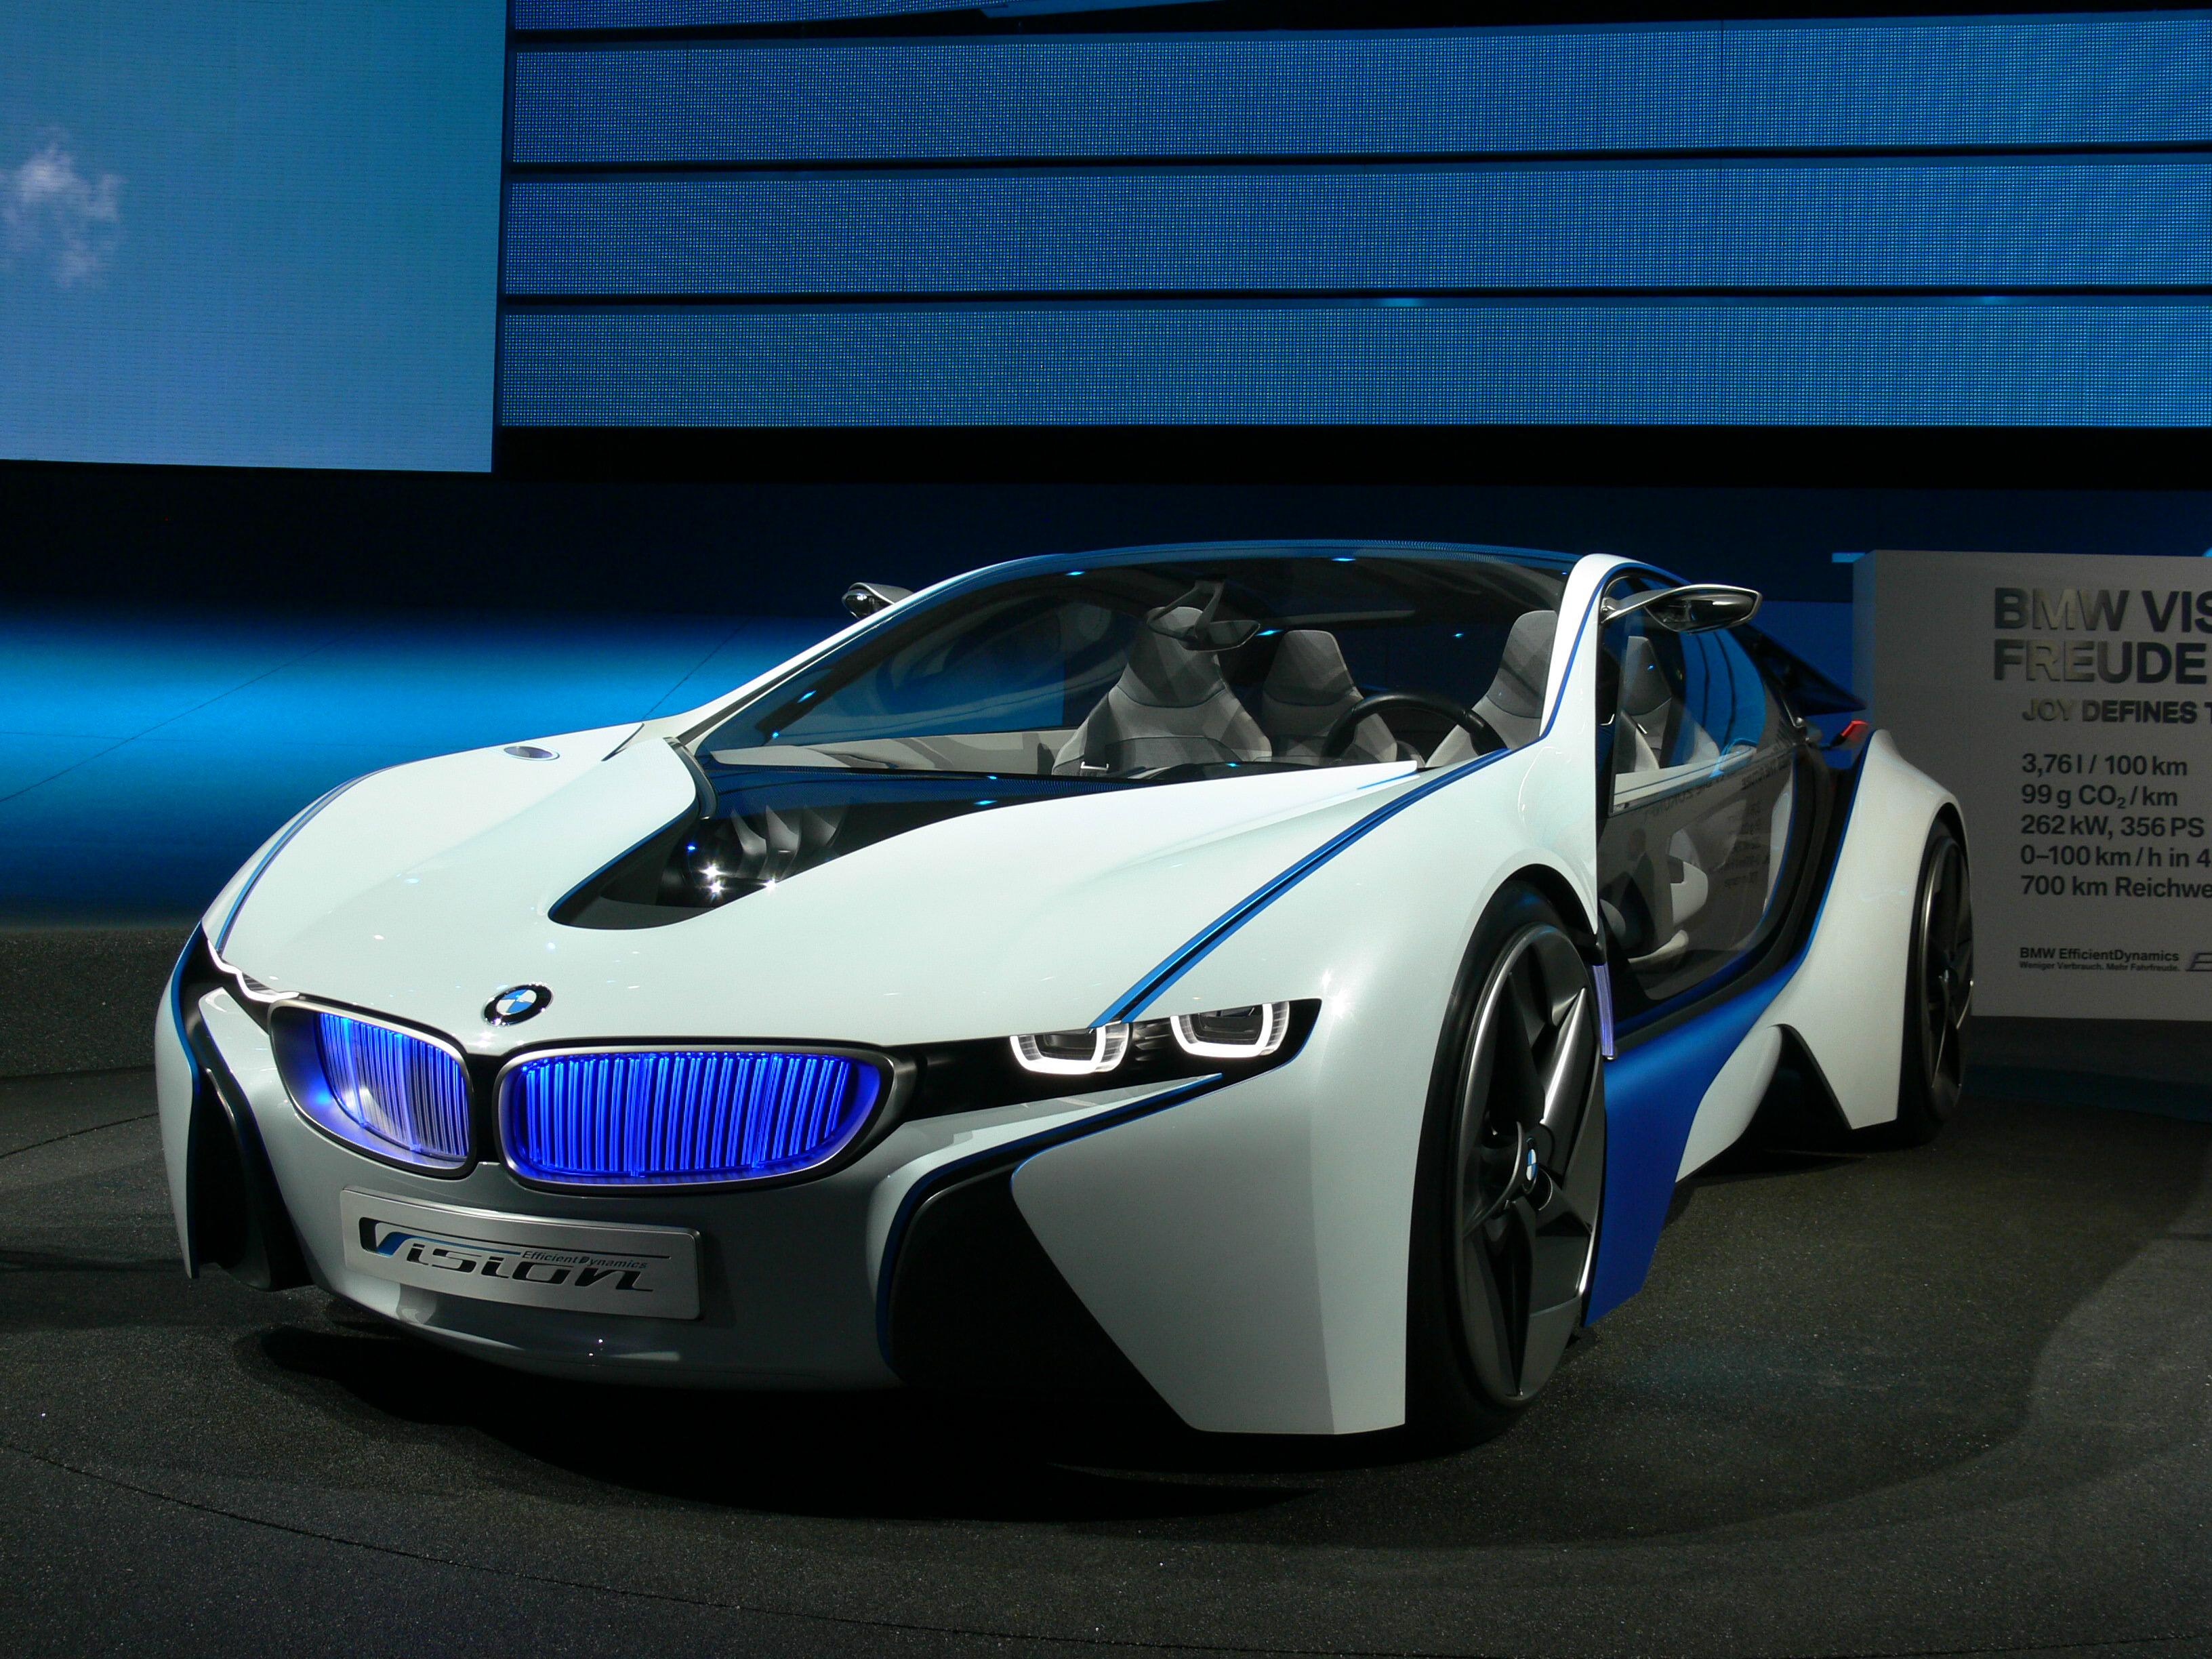 Bmw X9 Concept Vision Amazing Car